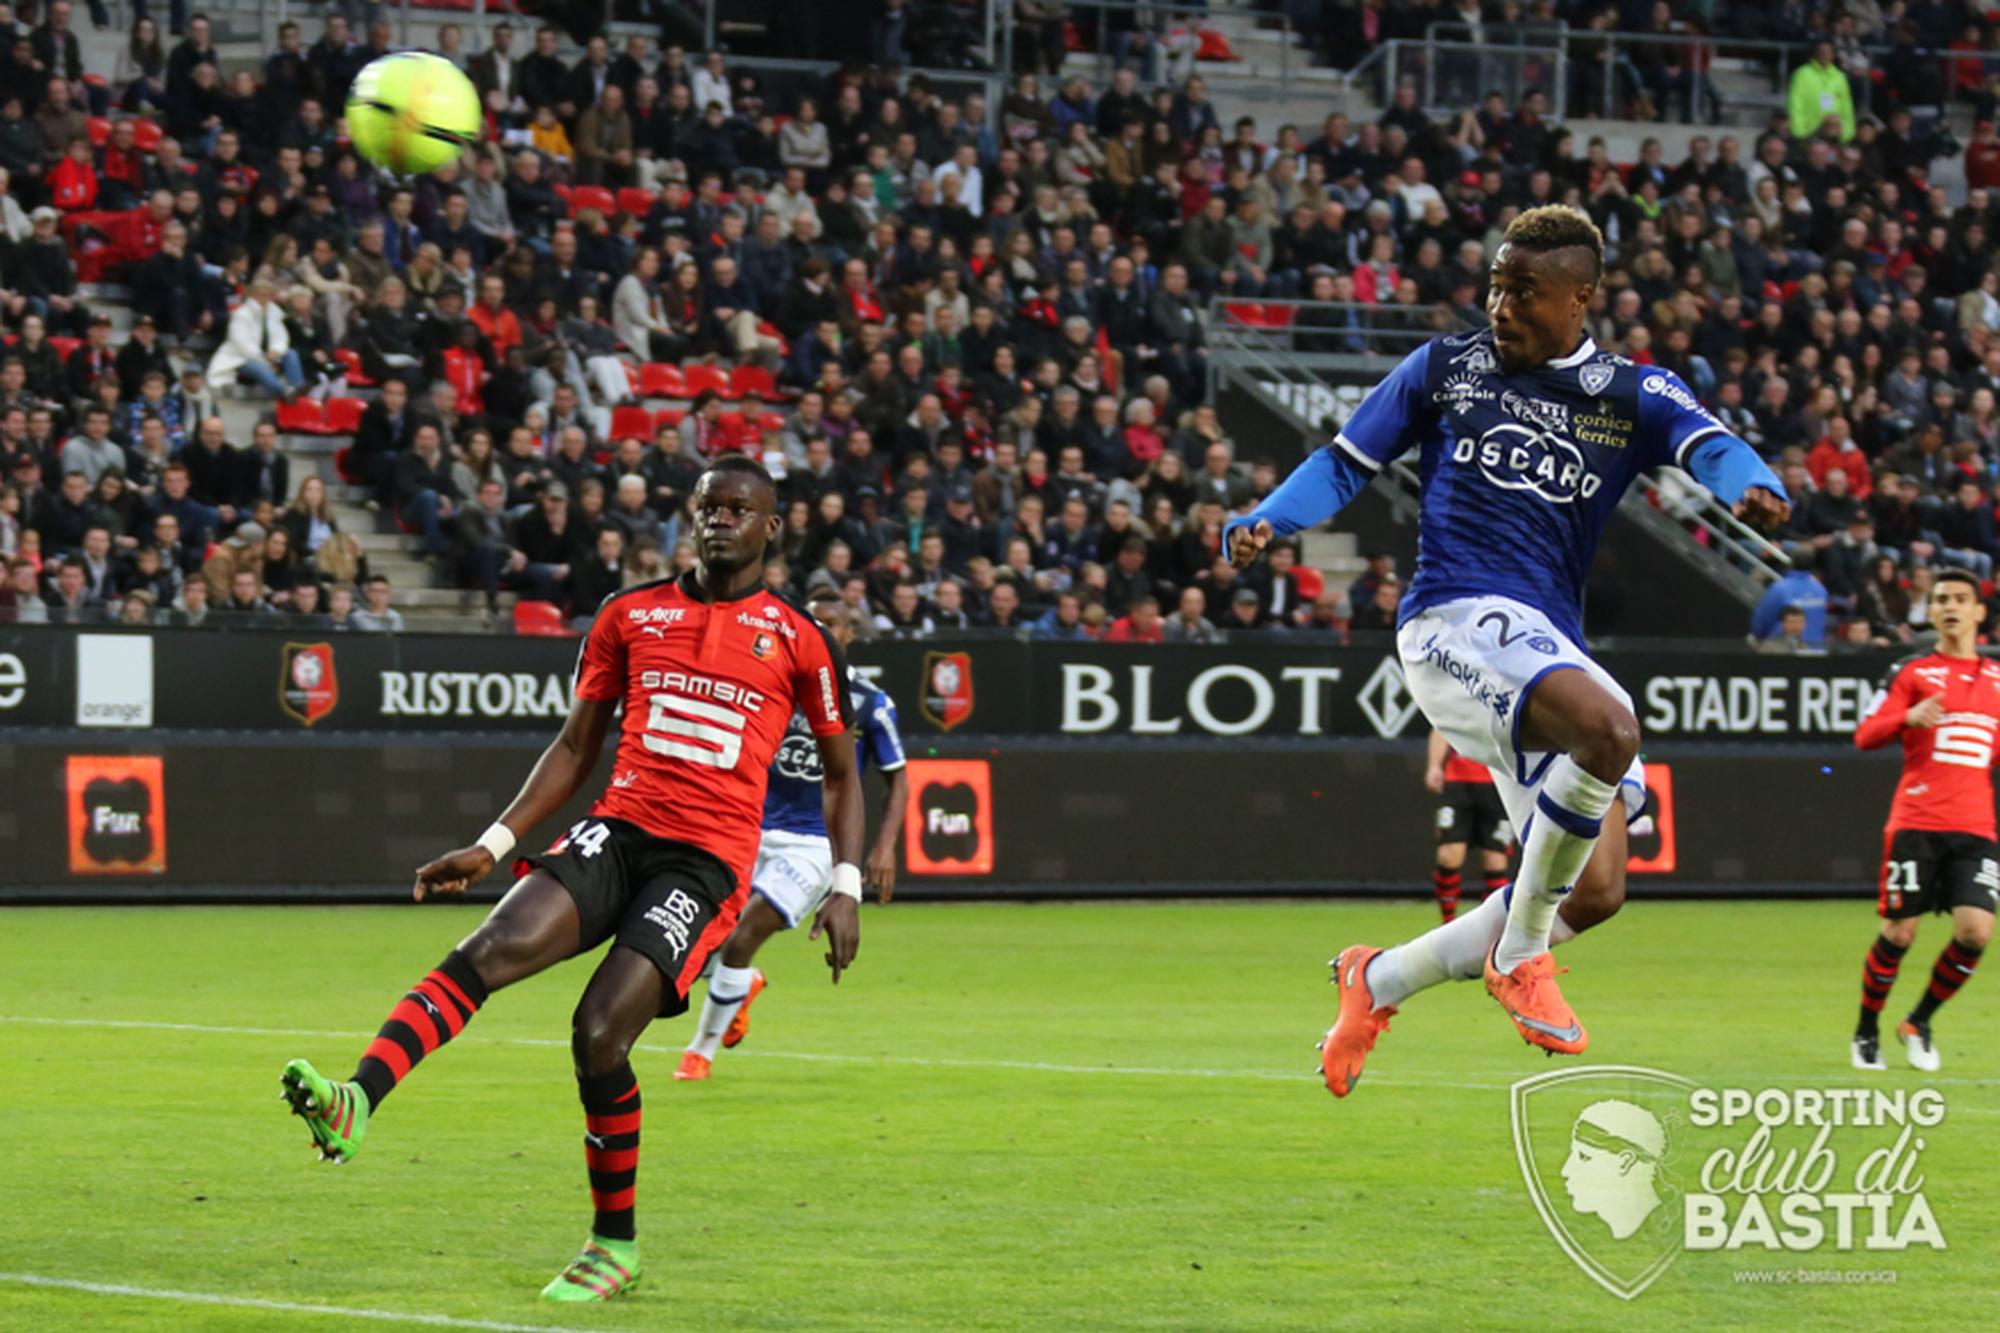 Rennes - Bastia